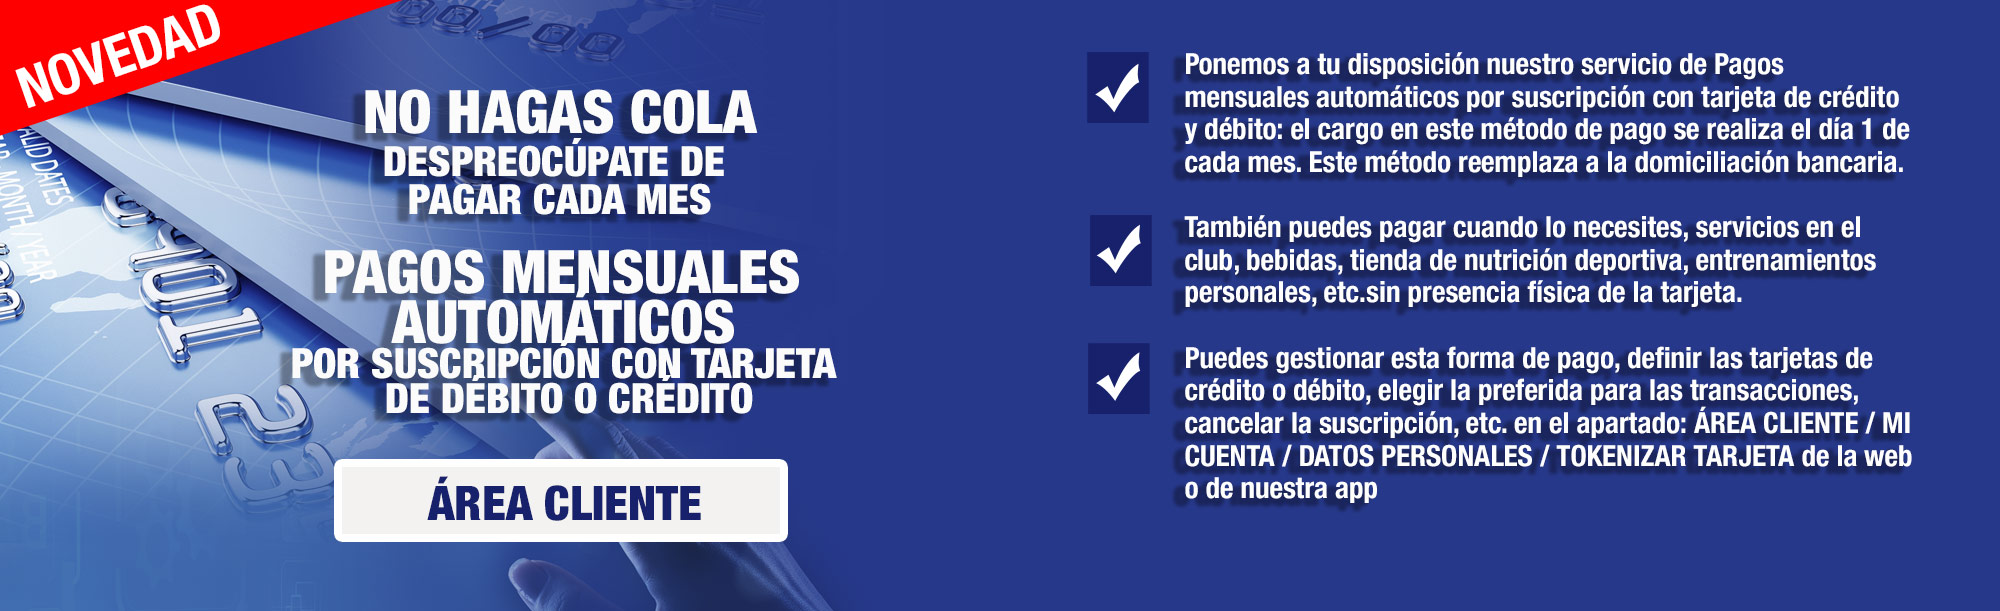 banner-web-pago-automatico